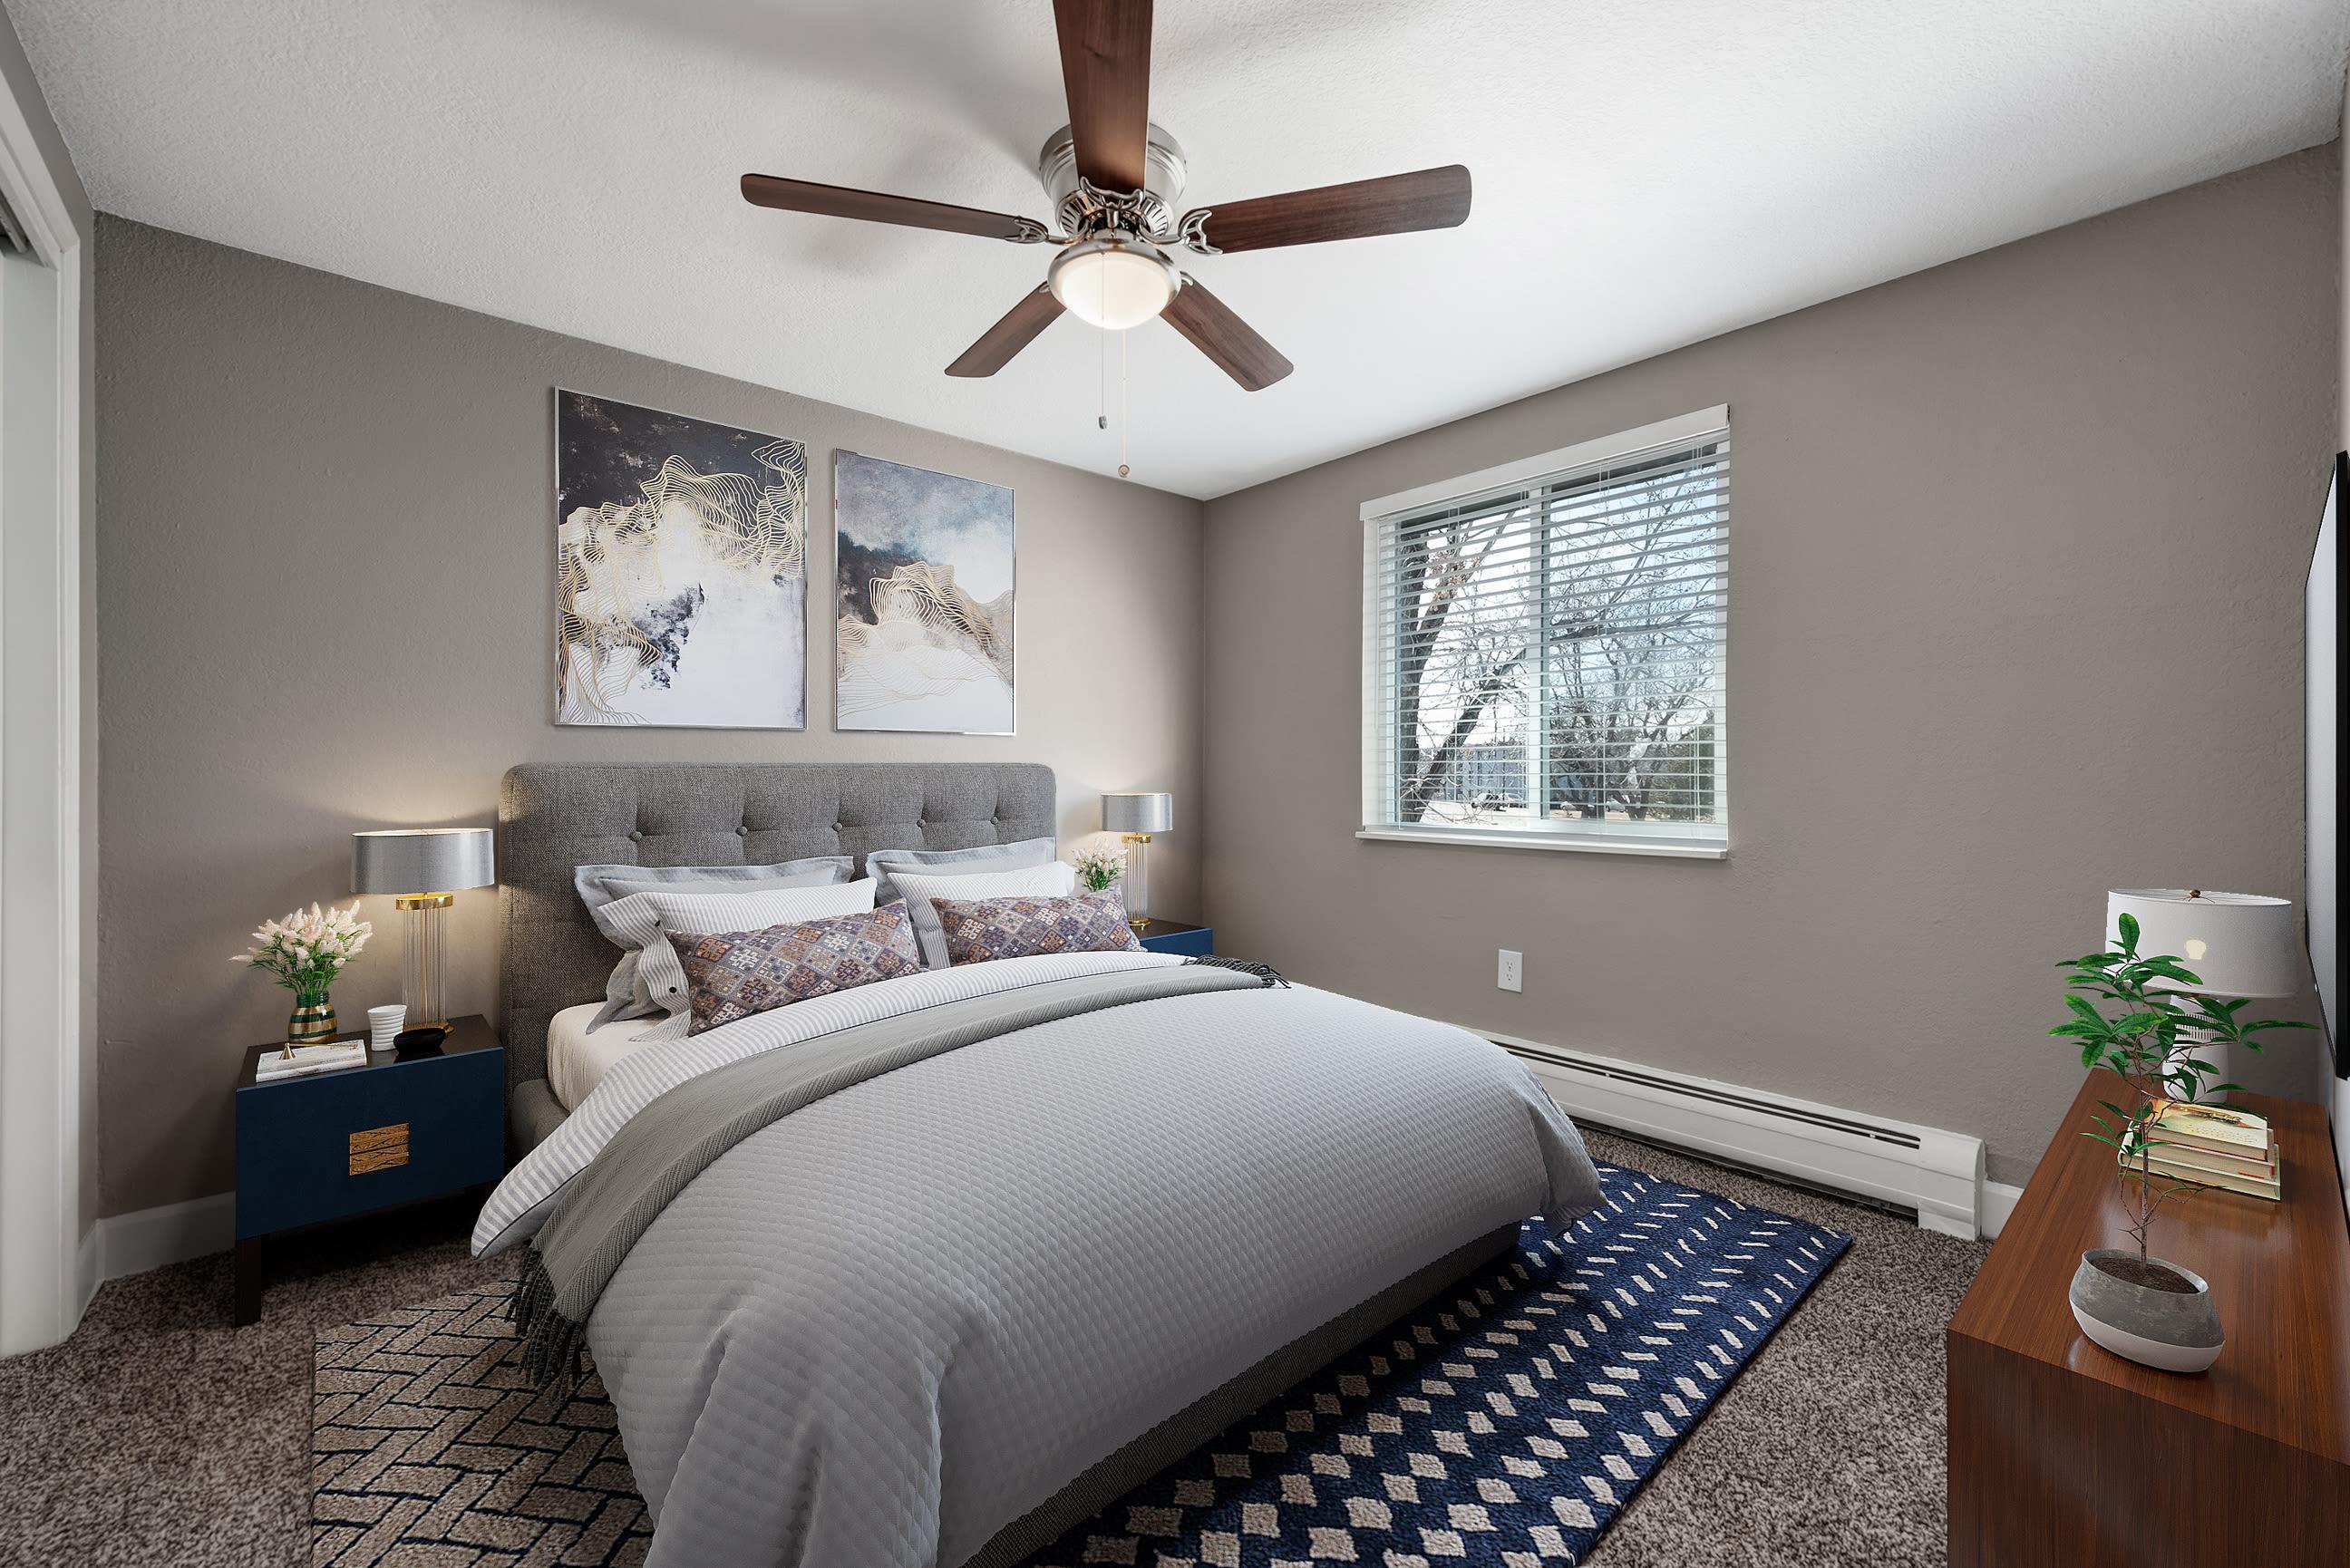 Model bedroom of Southglenn Place in Centennial, Colorado